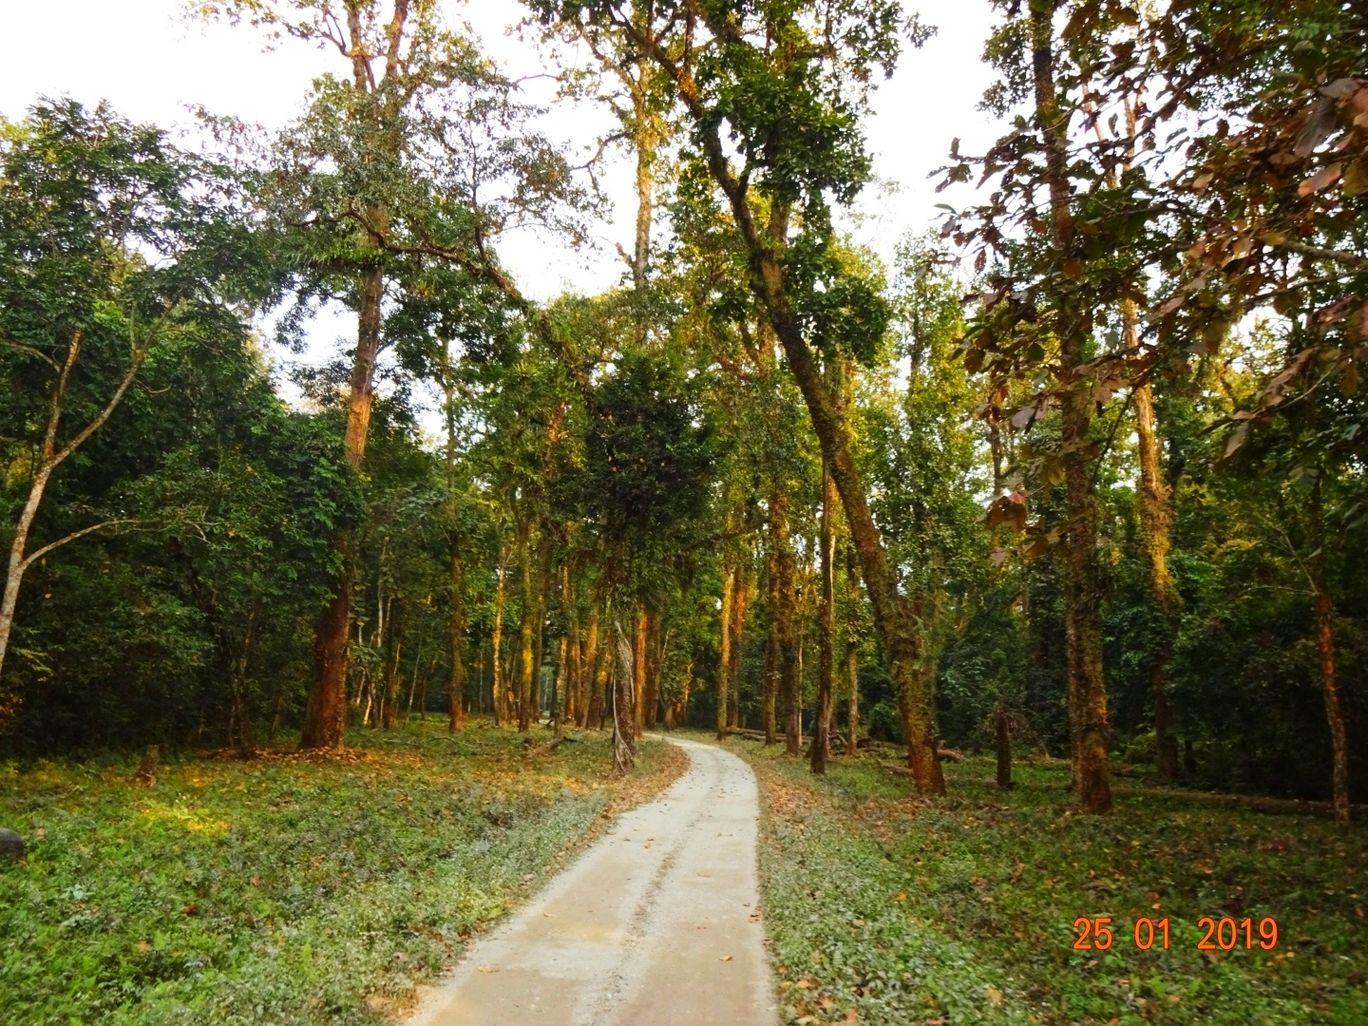 Photo of Gorumara National Park By Parikshit Das